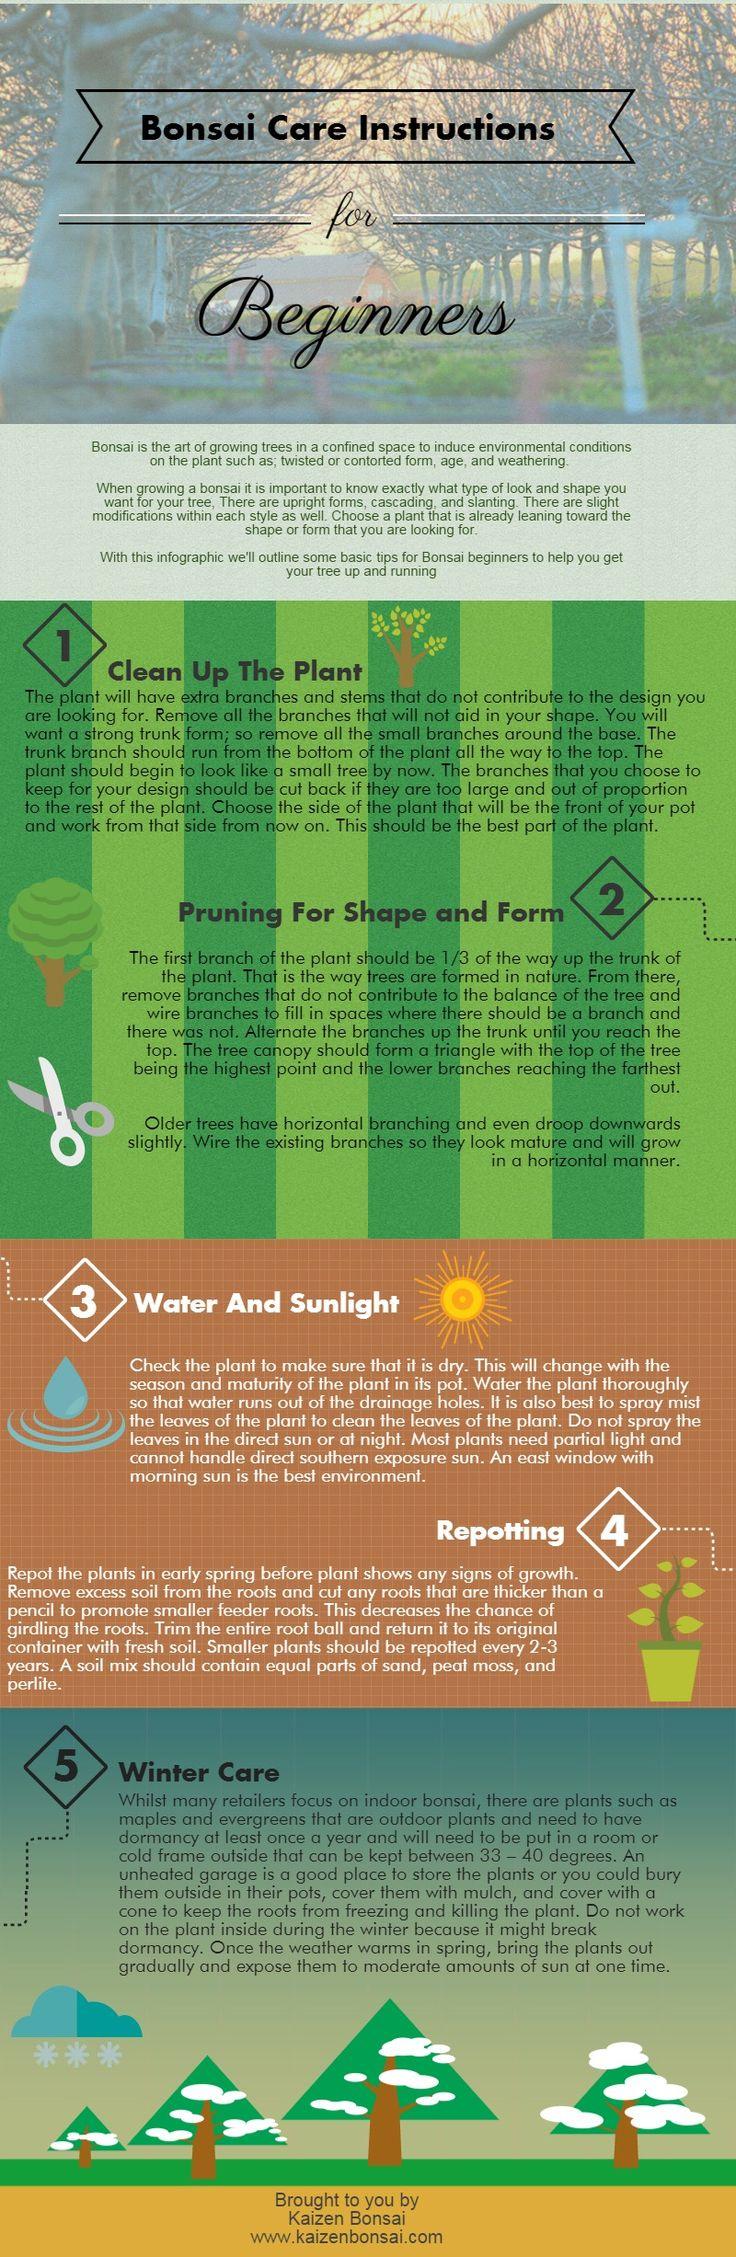 Bonsai Care Instructions for Beginners #bonsai #gardening | Created in #free @Piktochart #Infographic Editor at www.piktochart.com